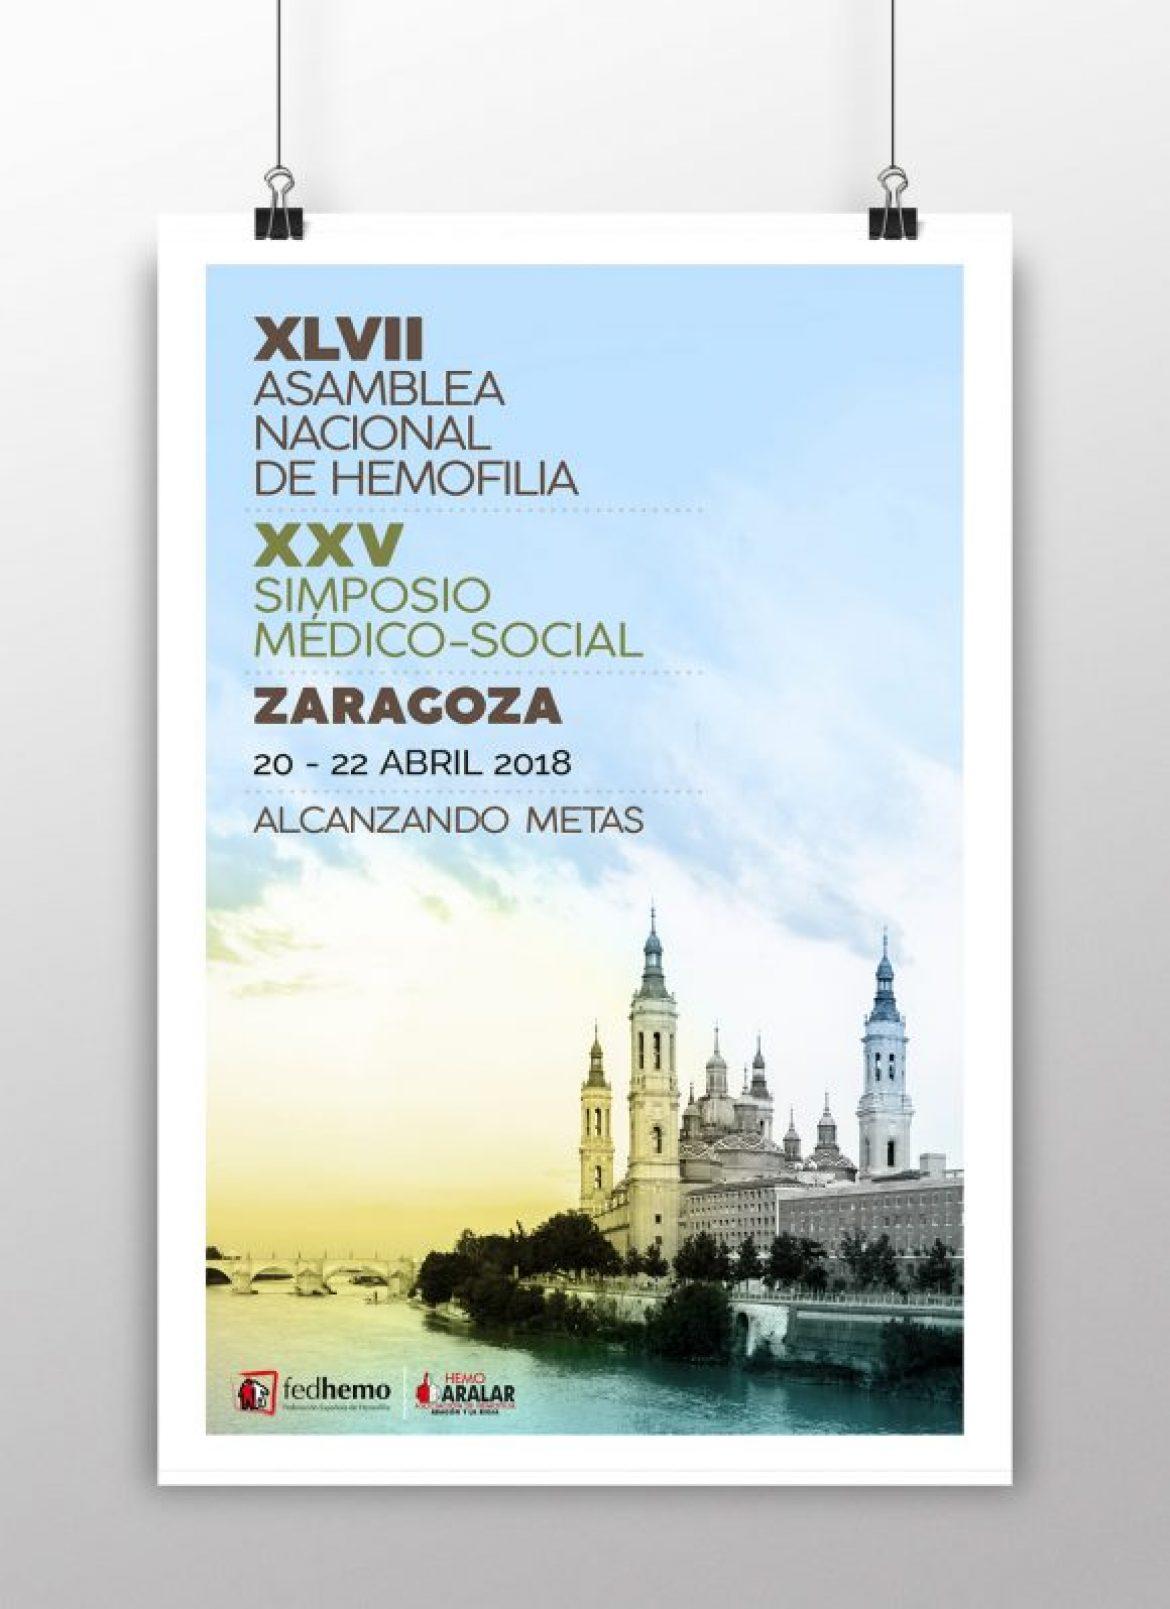 XLVII Asamblea Nacional de hemofilia 2018 – Zaragoza